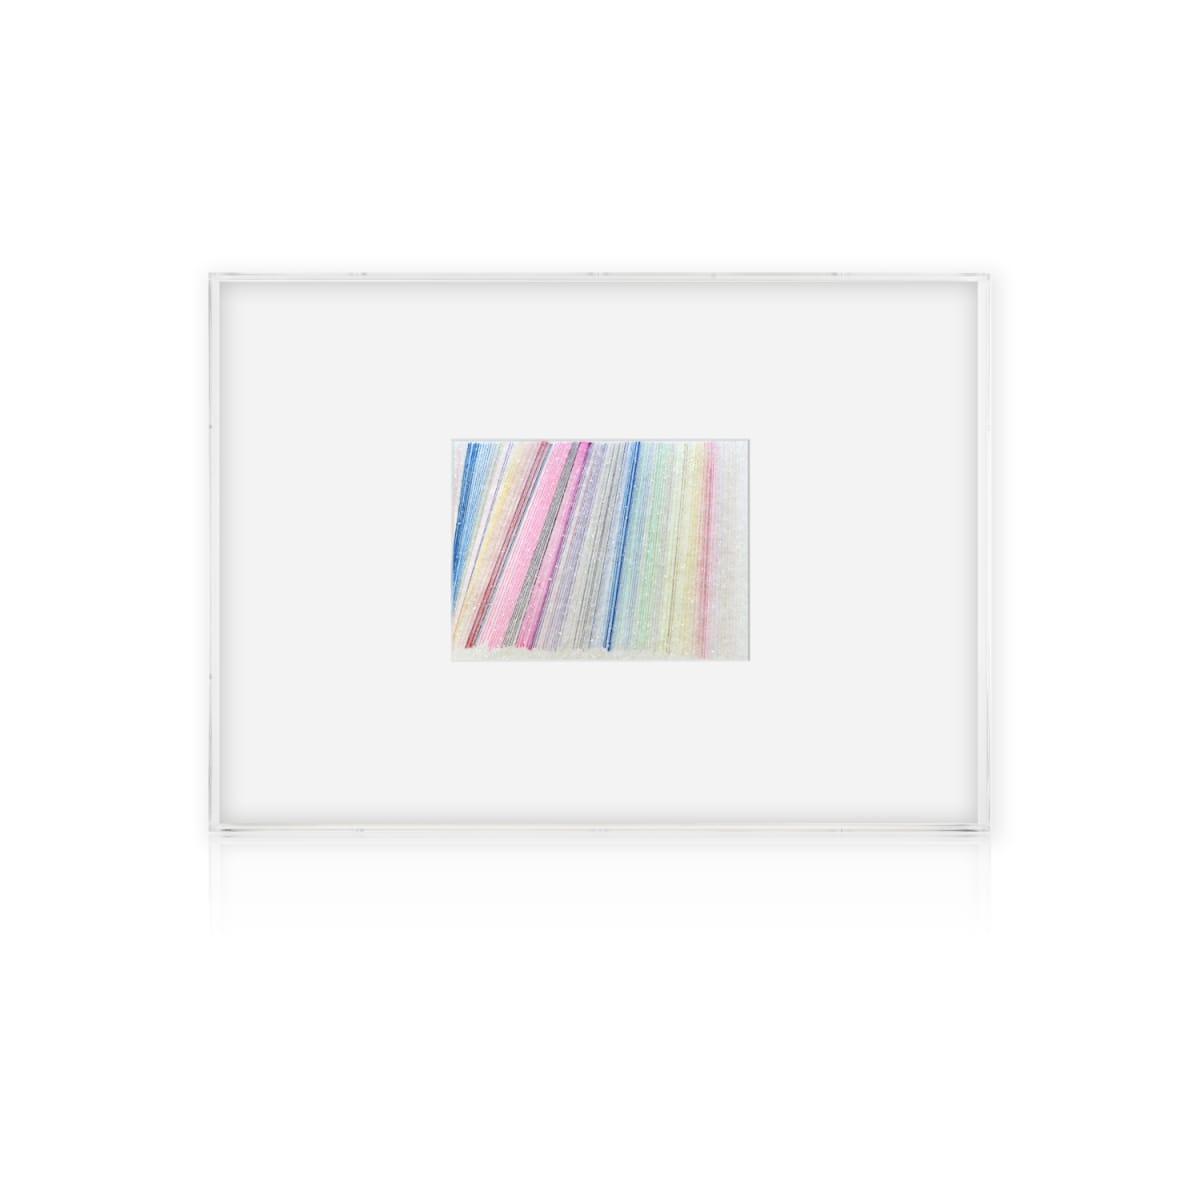 Chromatic Rainbow 18x22, 2021